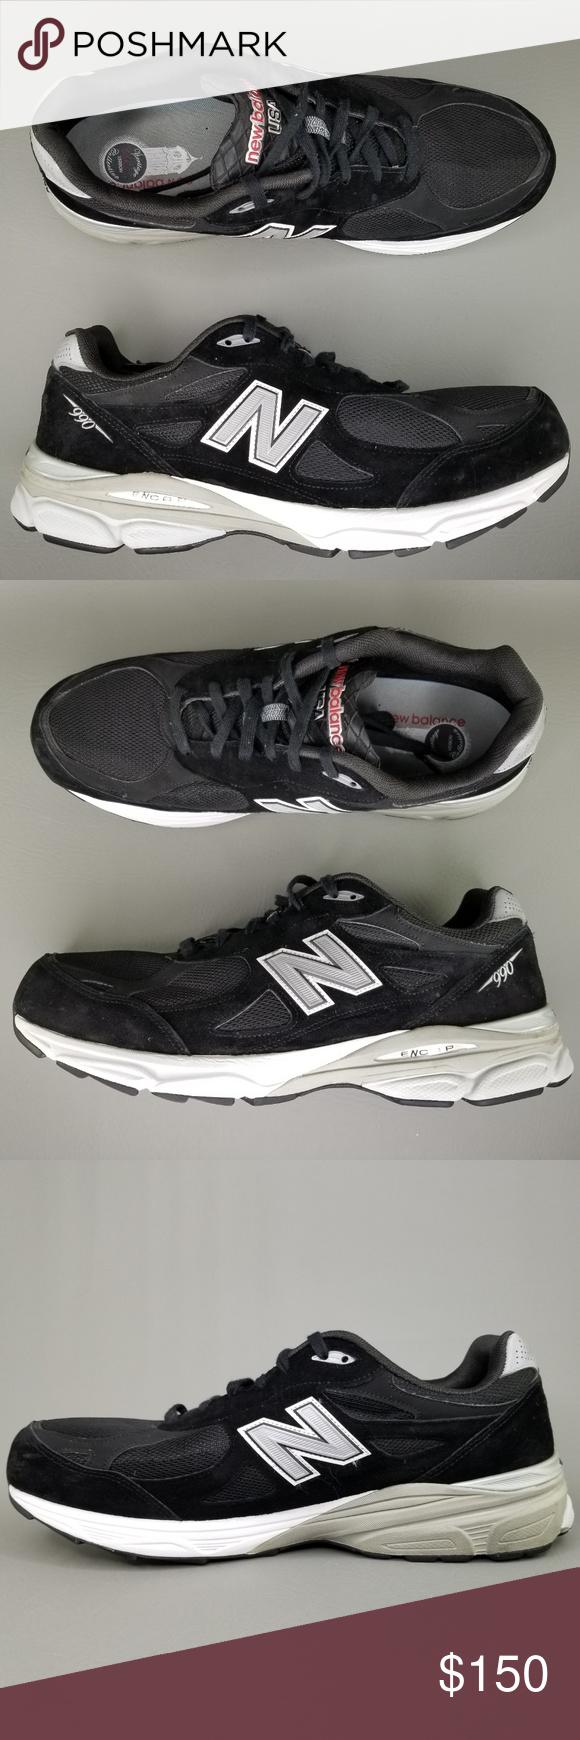 New Balance 990 Made in USA Running